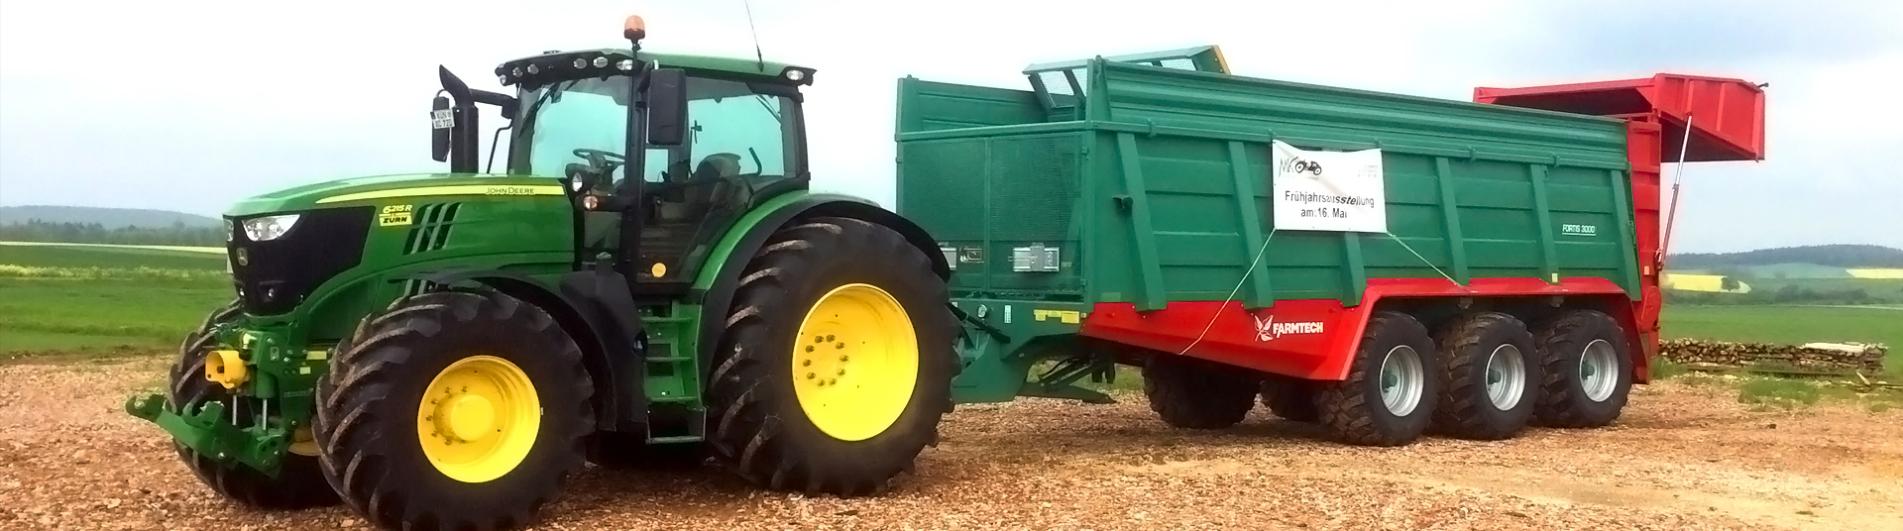 MK Landmaschinen-Vertrieb Foto Traktor